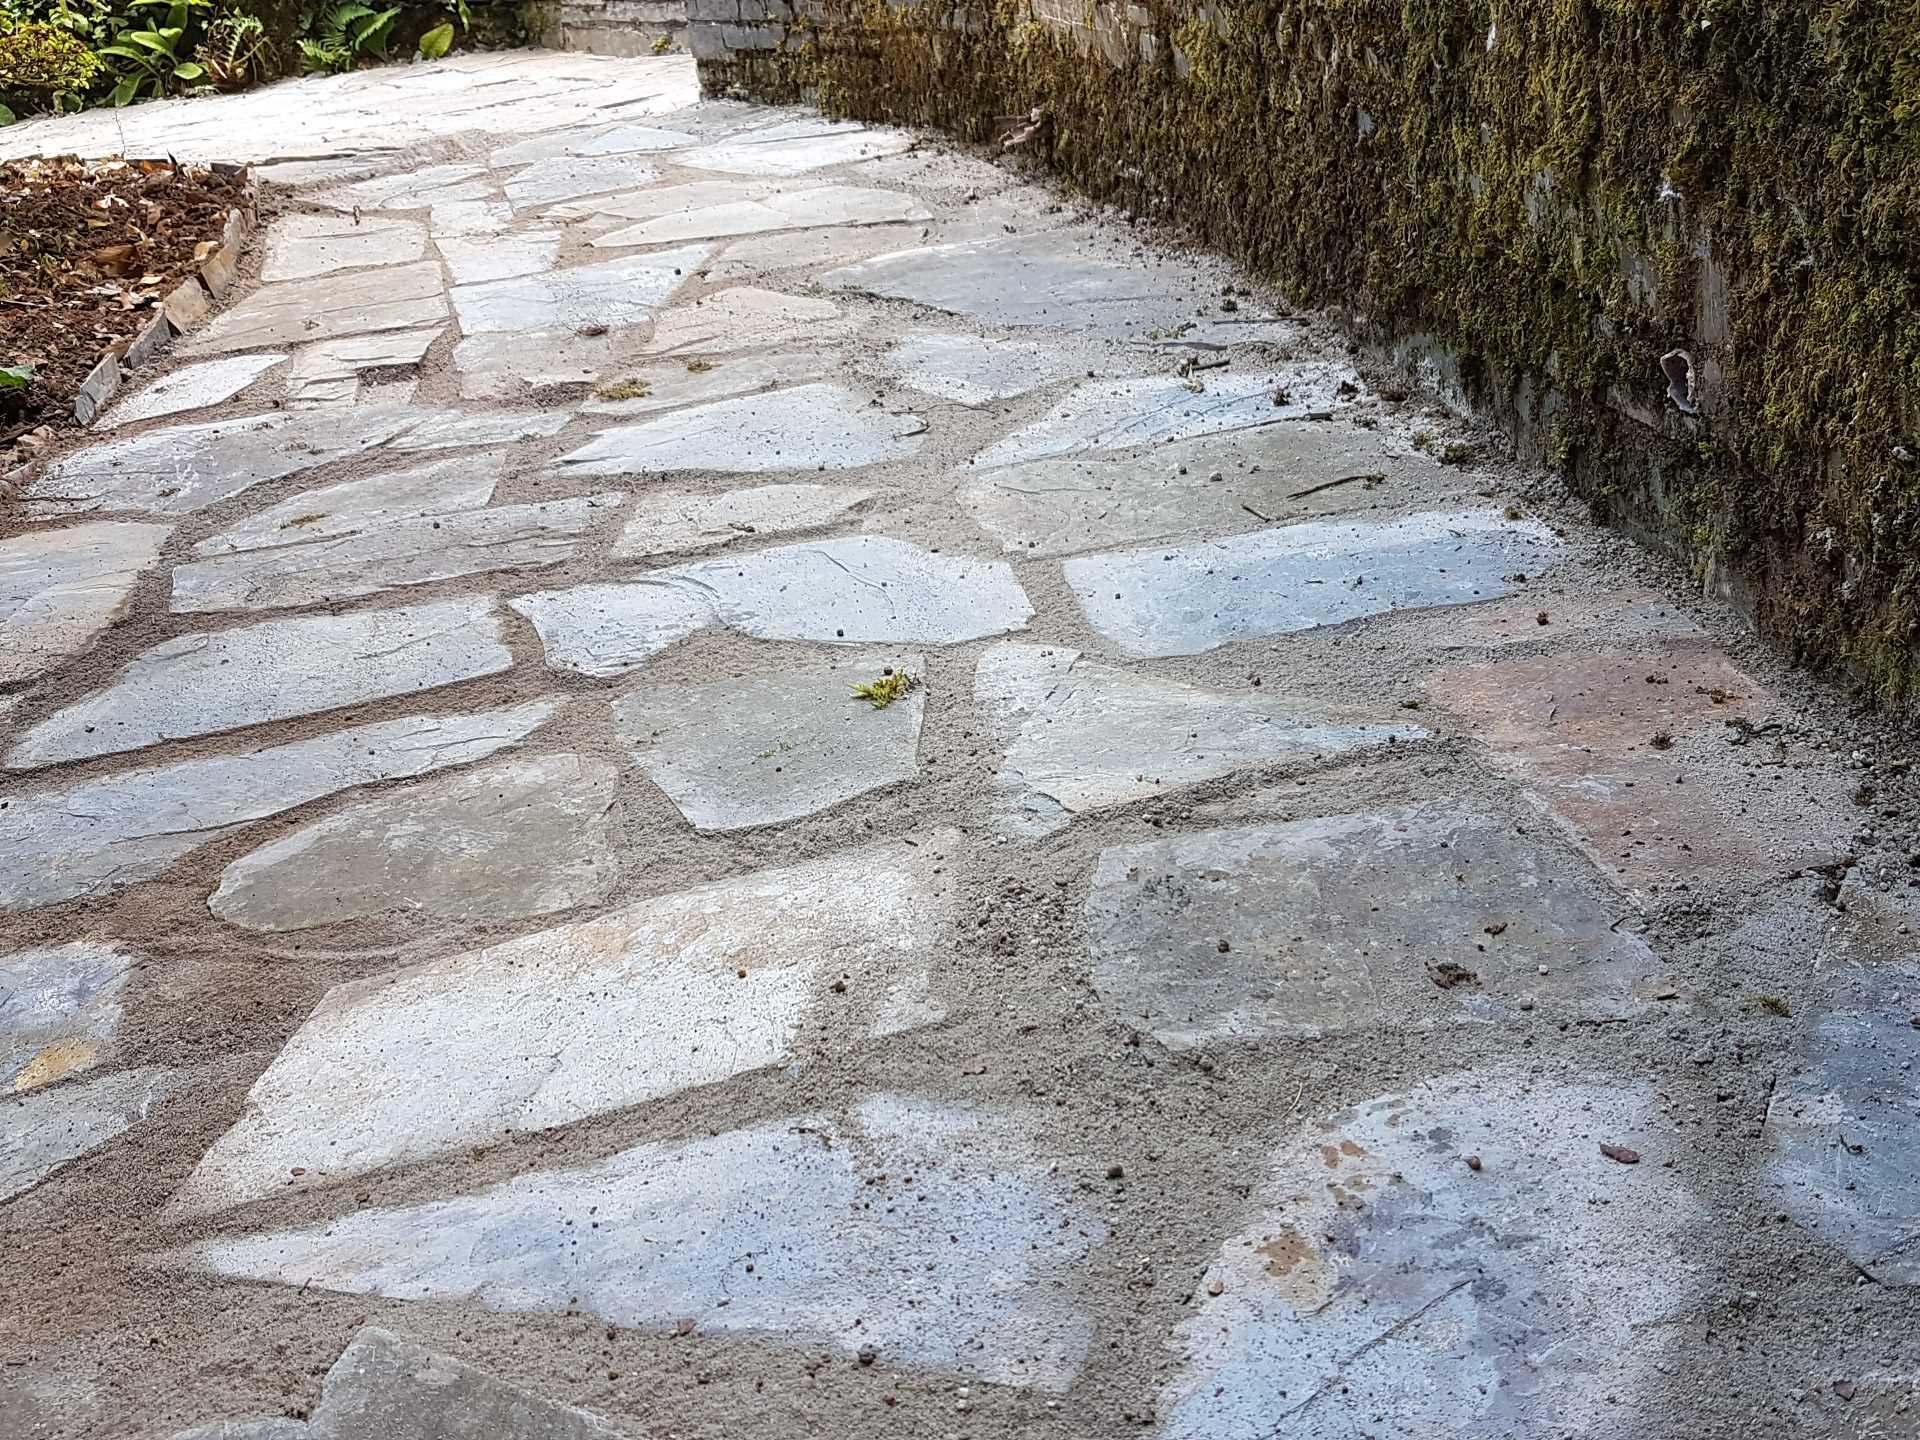 Slate path, natural stone path